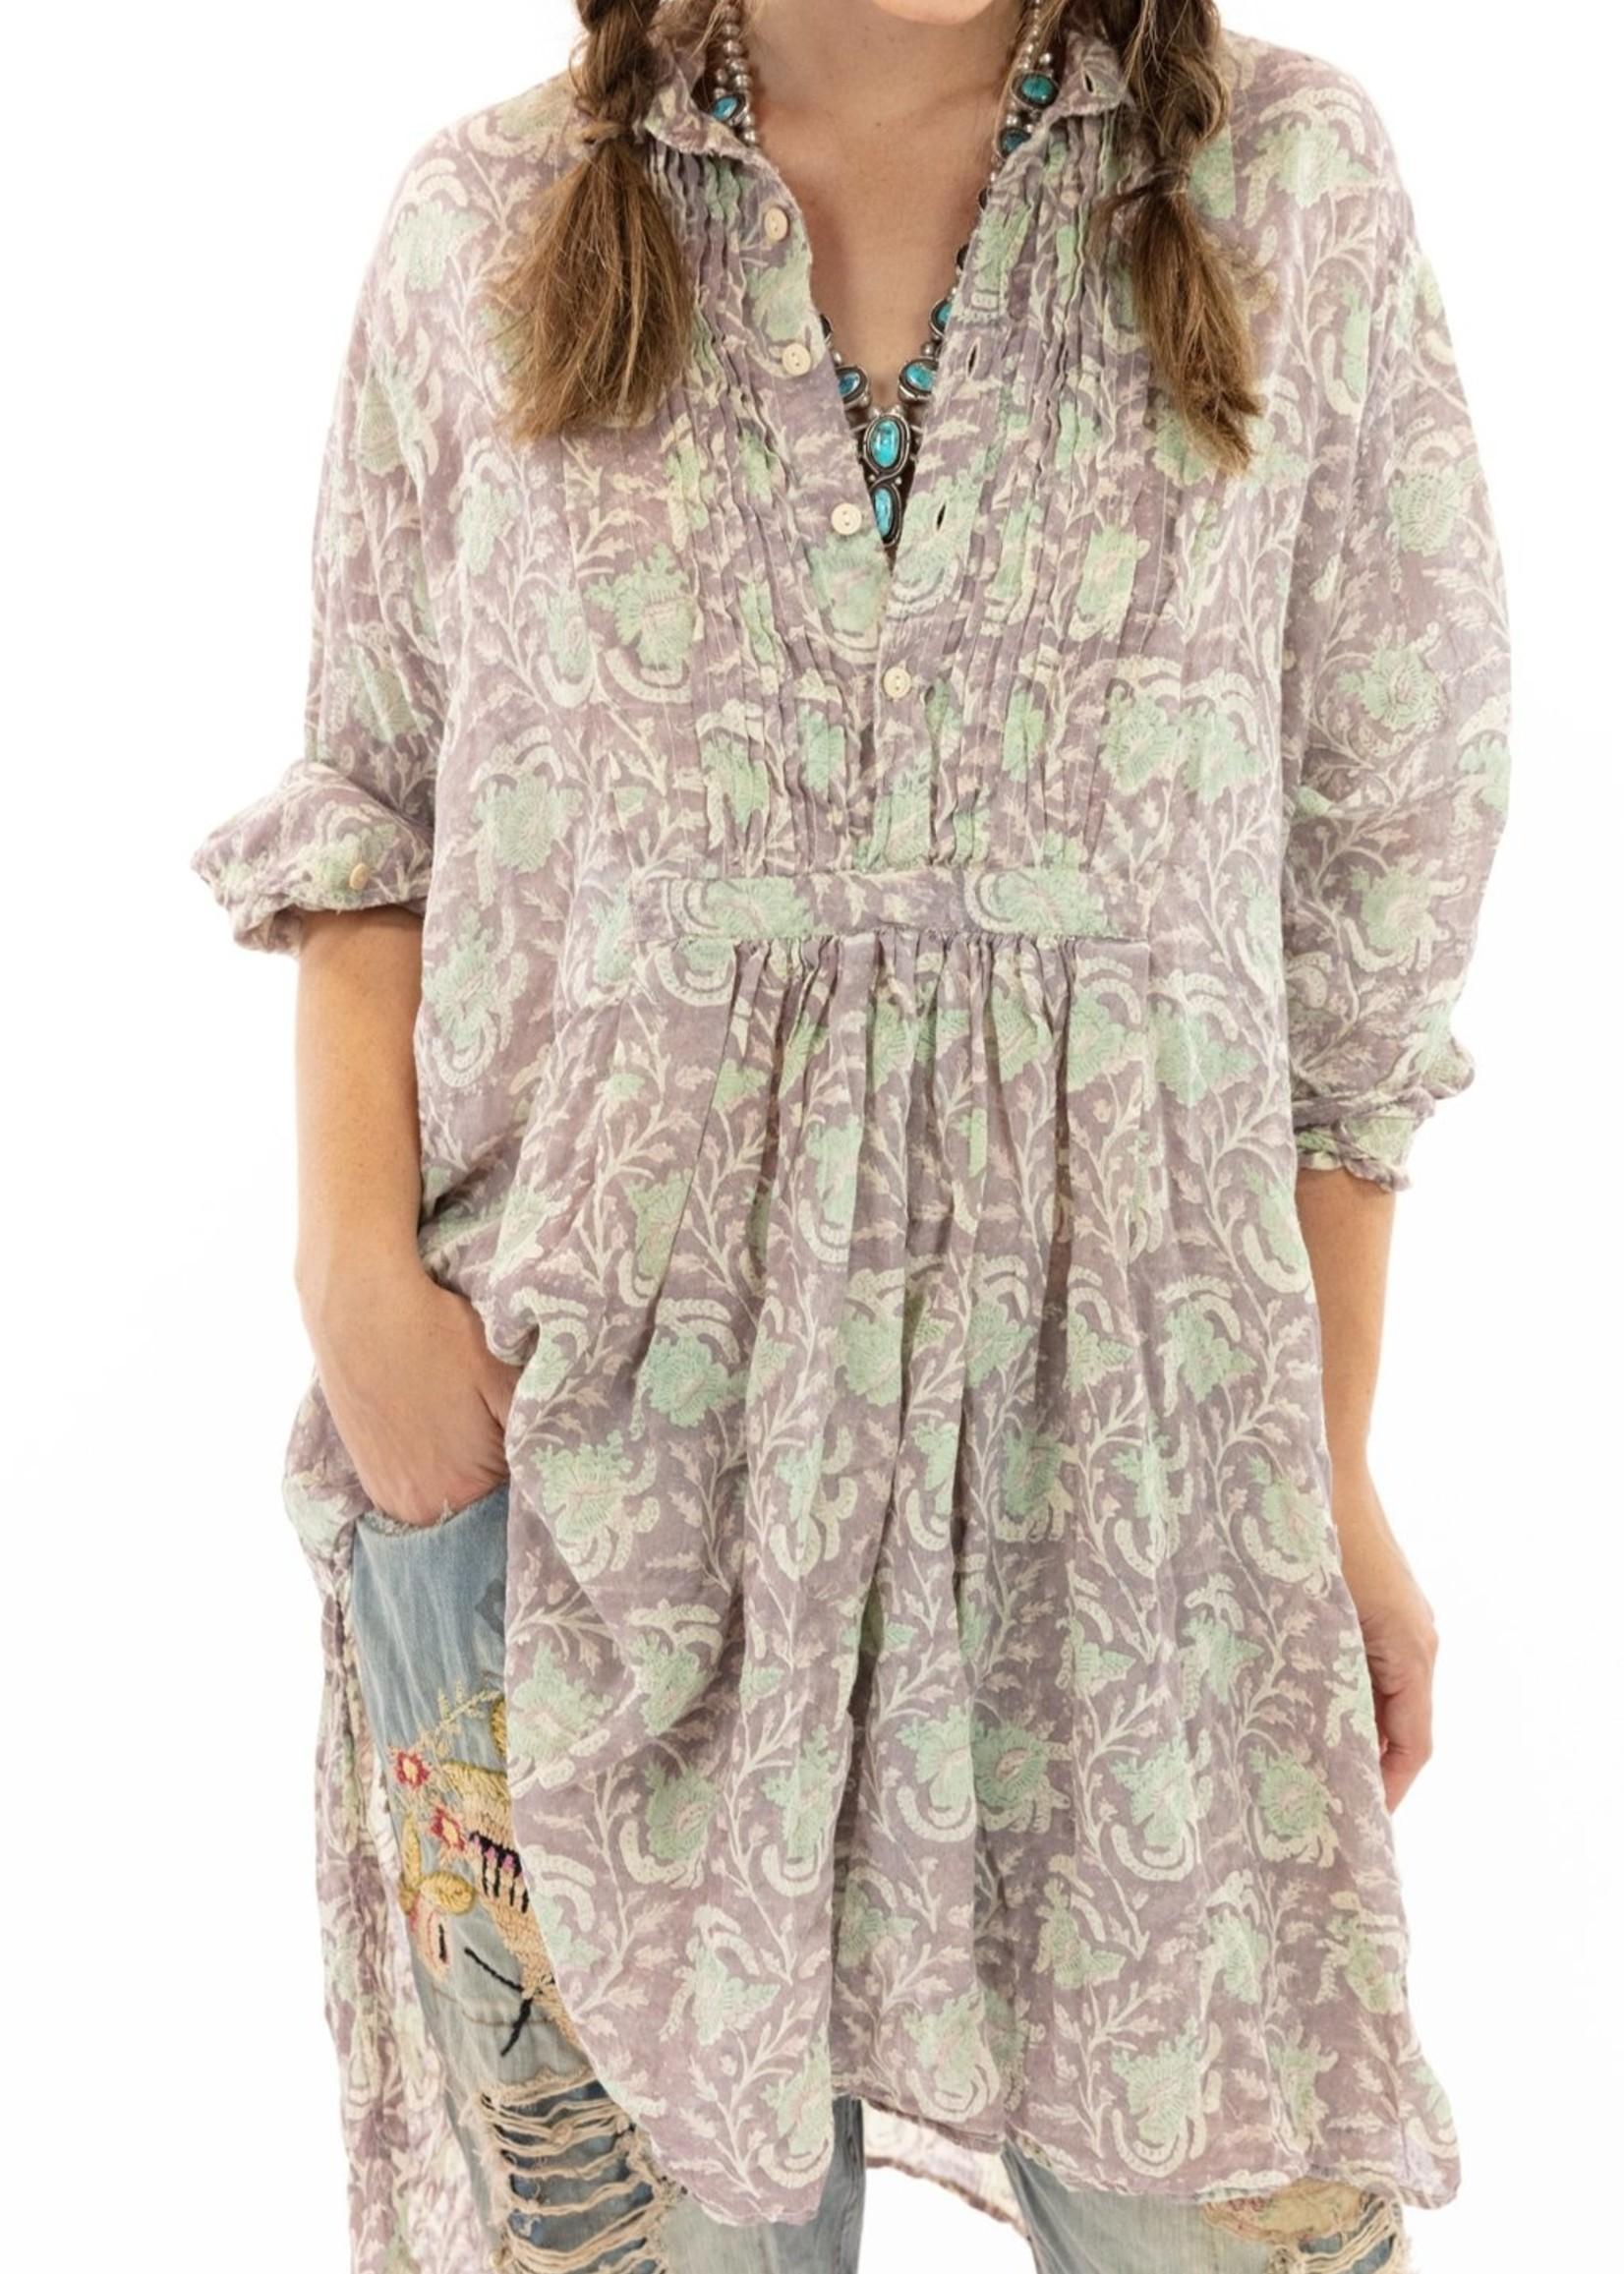 Magnolia Pearl Cordelia Night Shirt Dress - Lissa